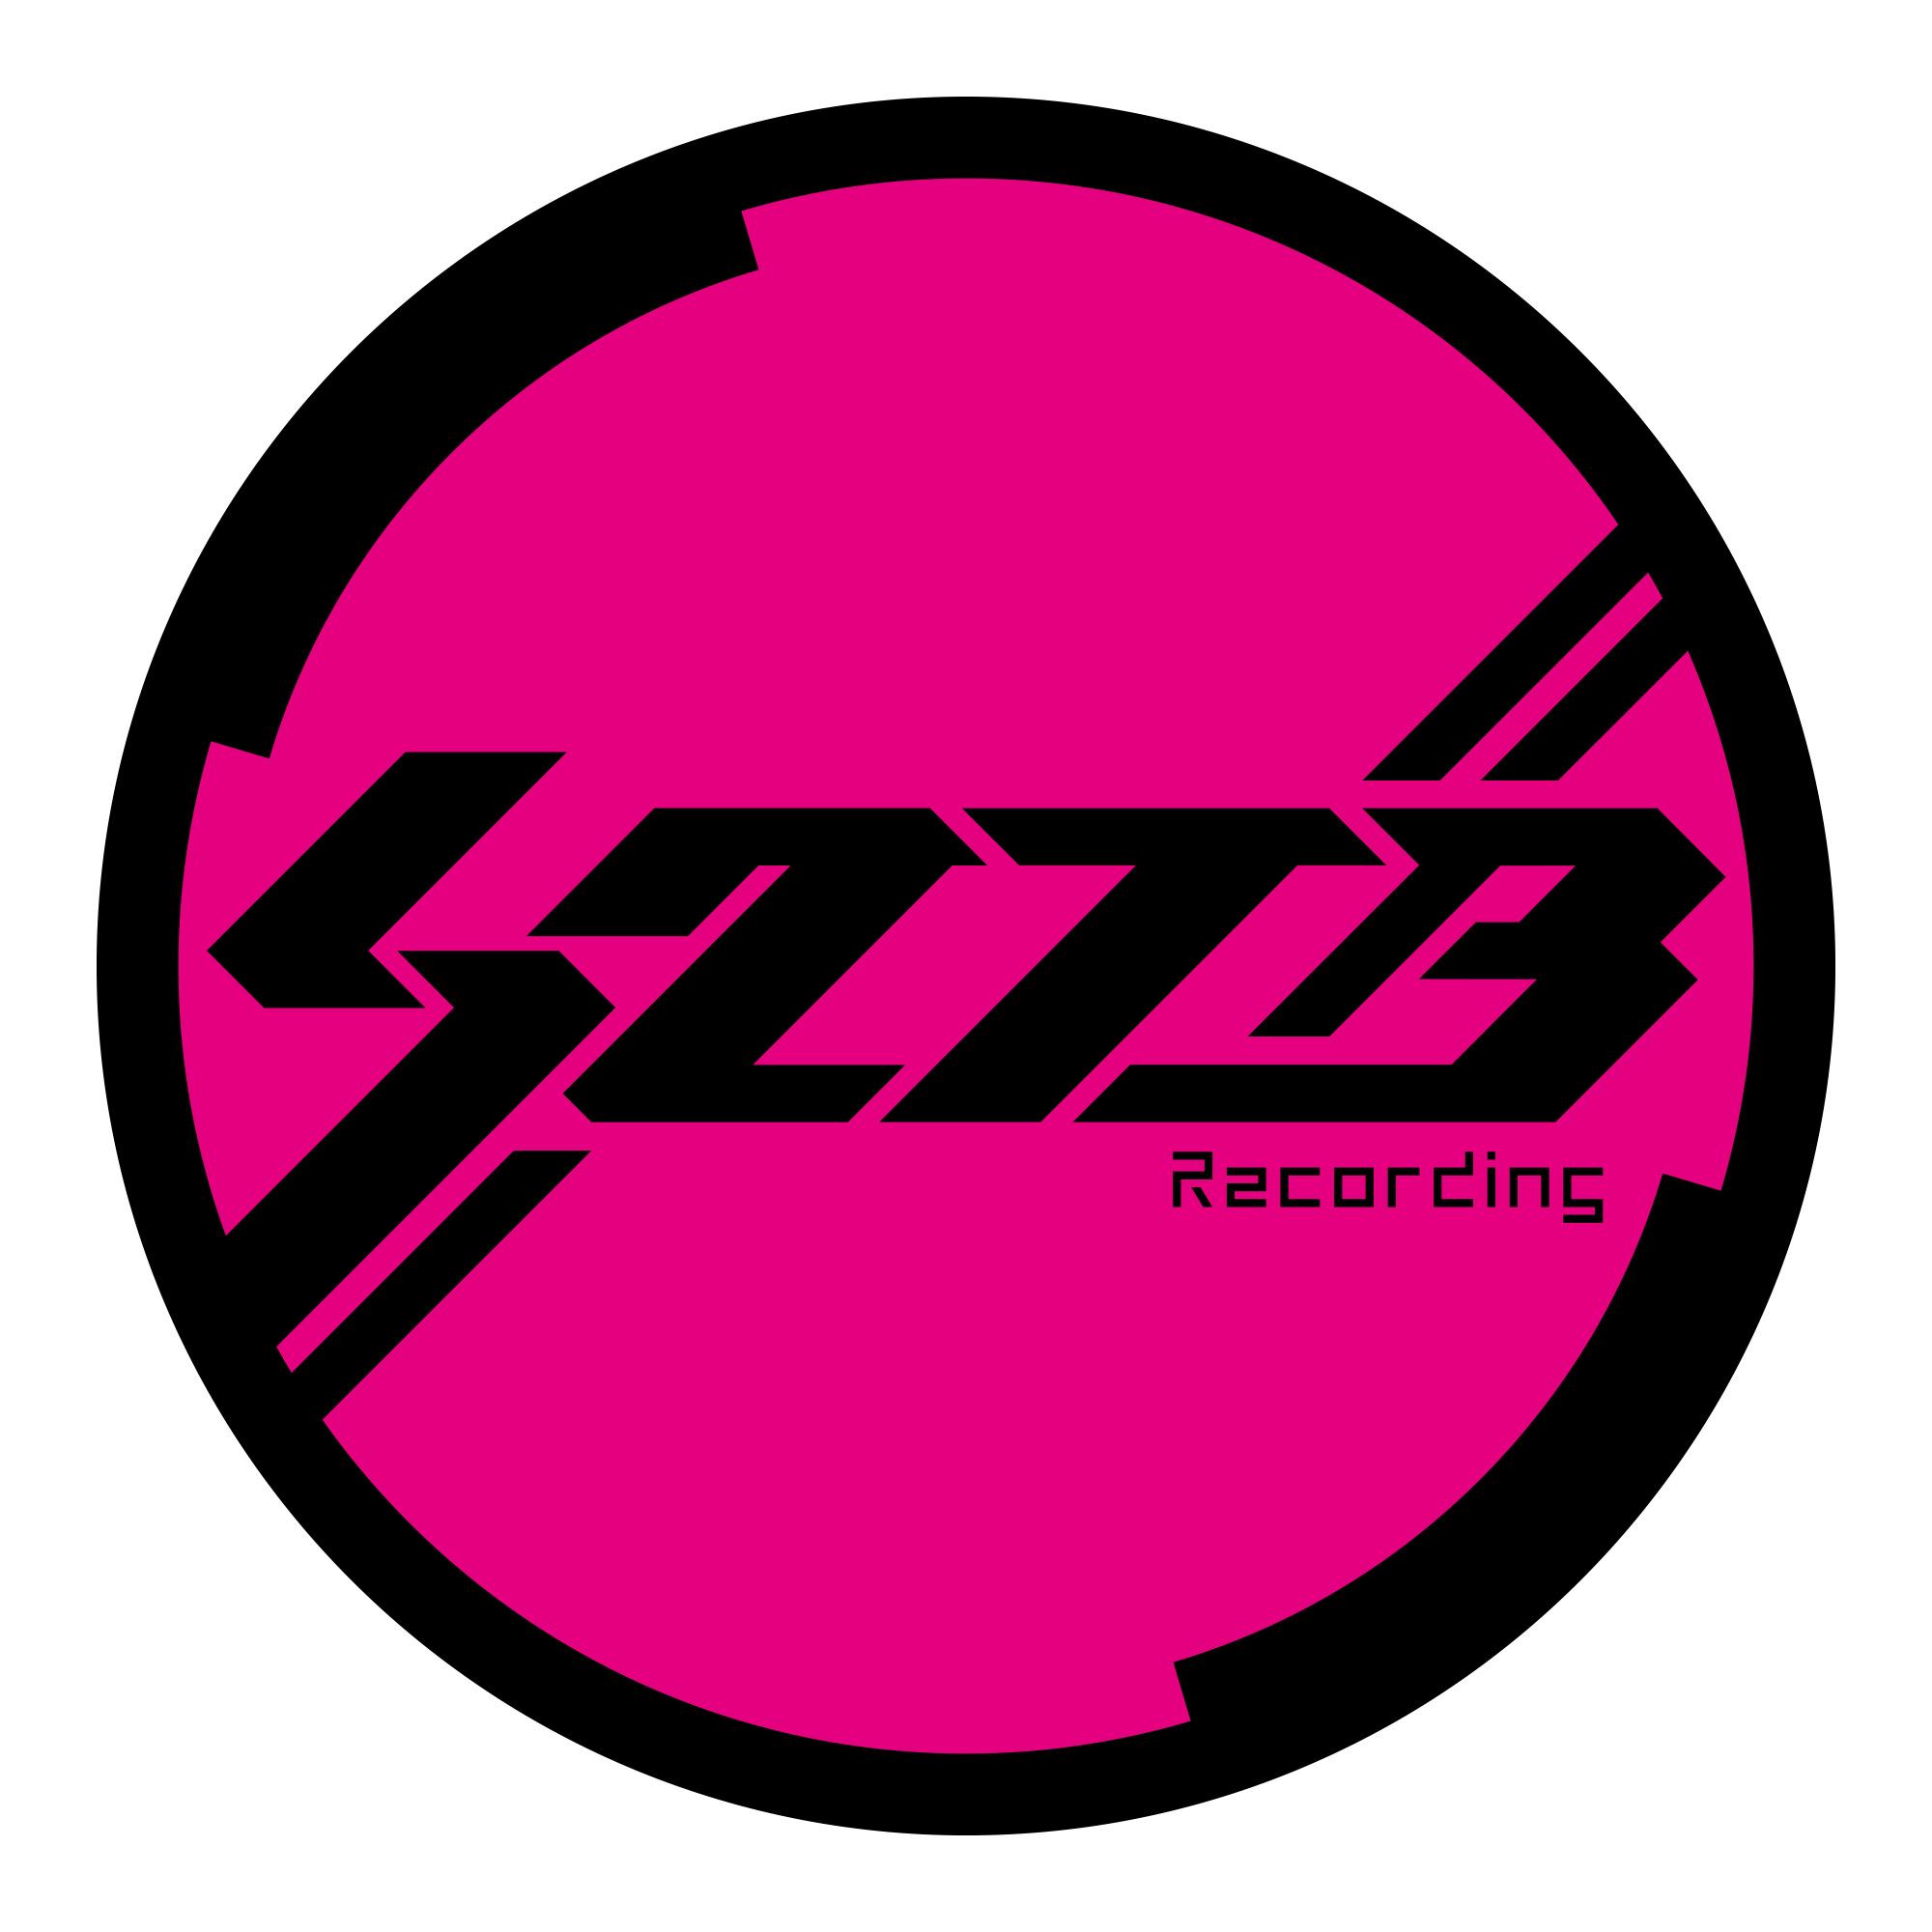 S2TB Recording Logo